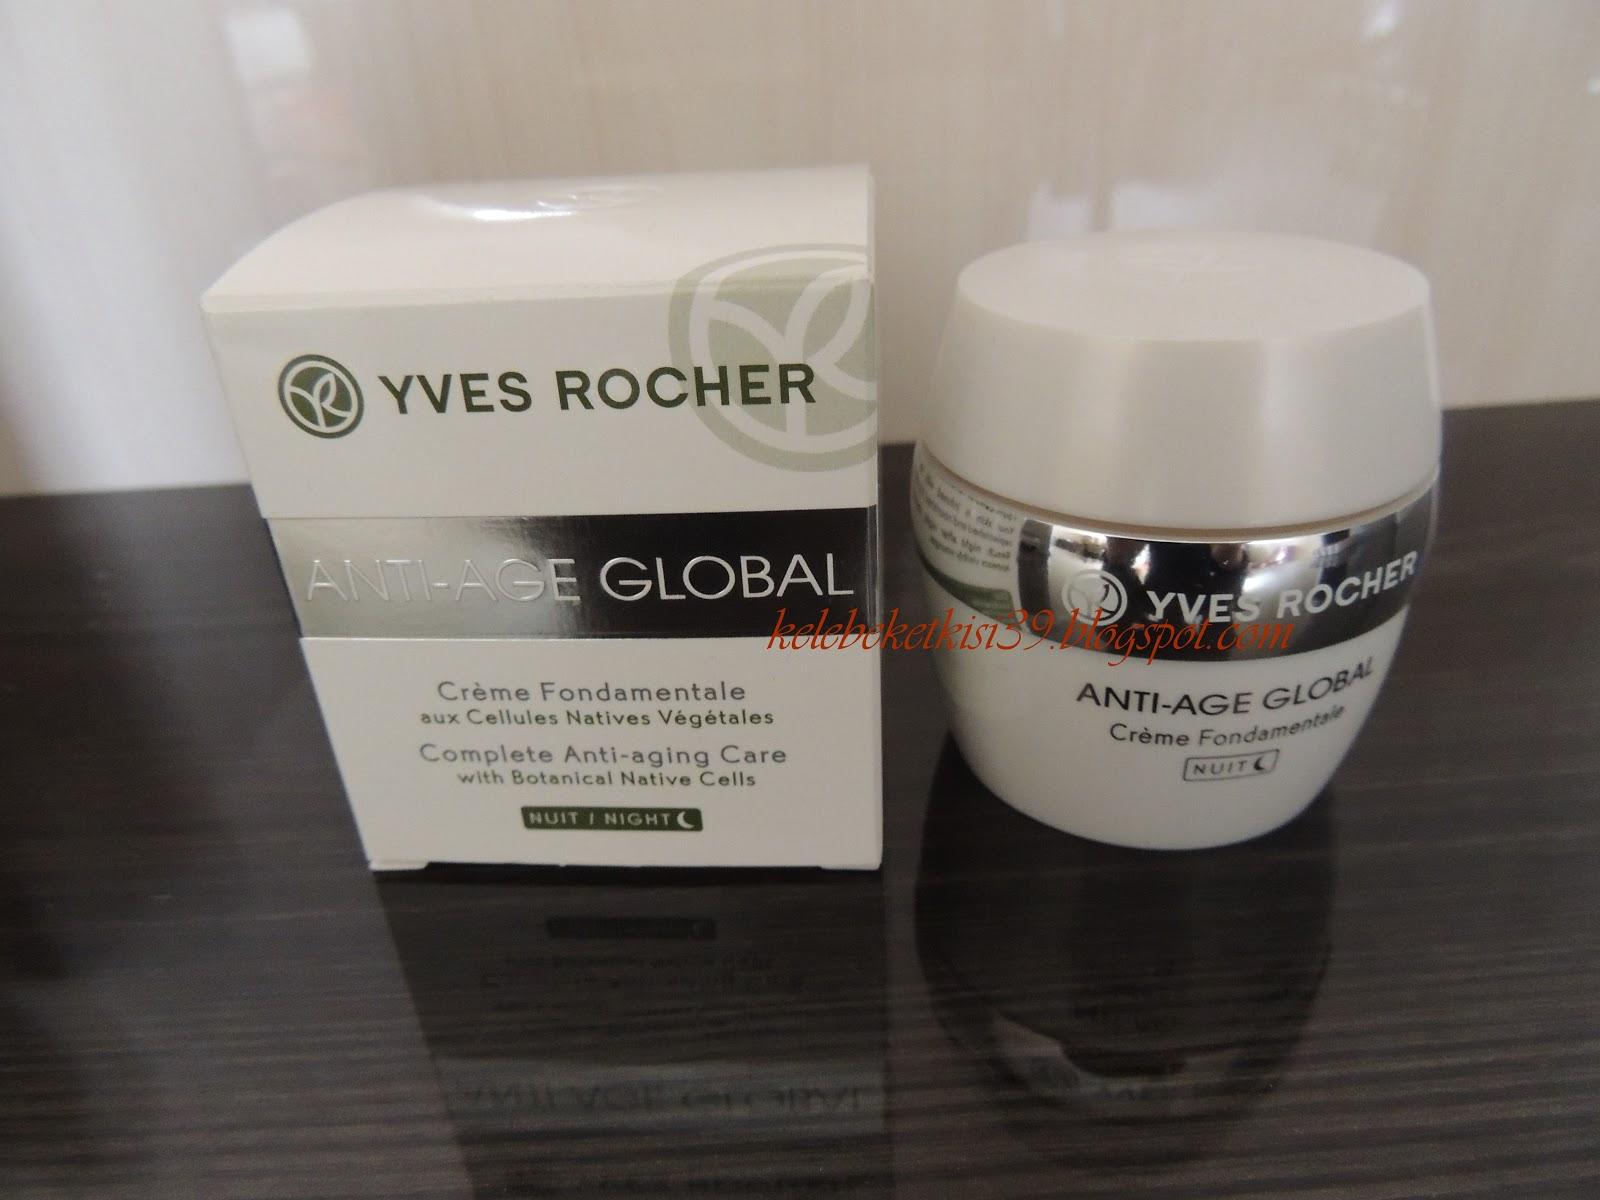 Yves Rocher Anti Age Global Gece Kremi Kelebek Etkisi Makyaj